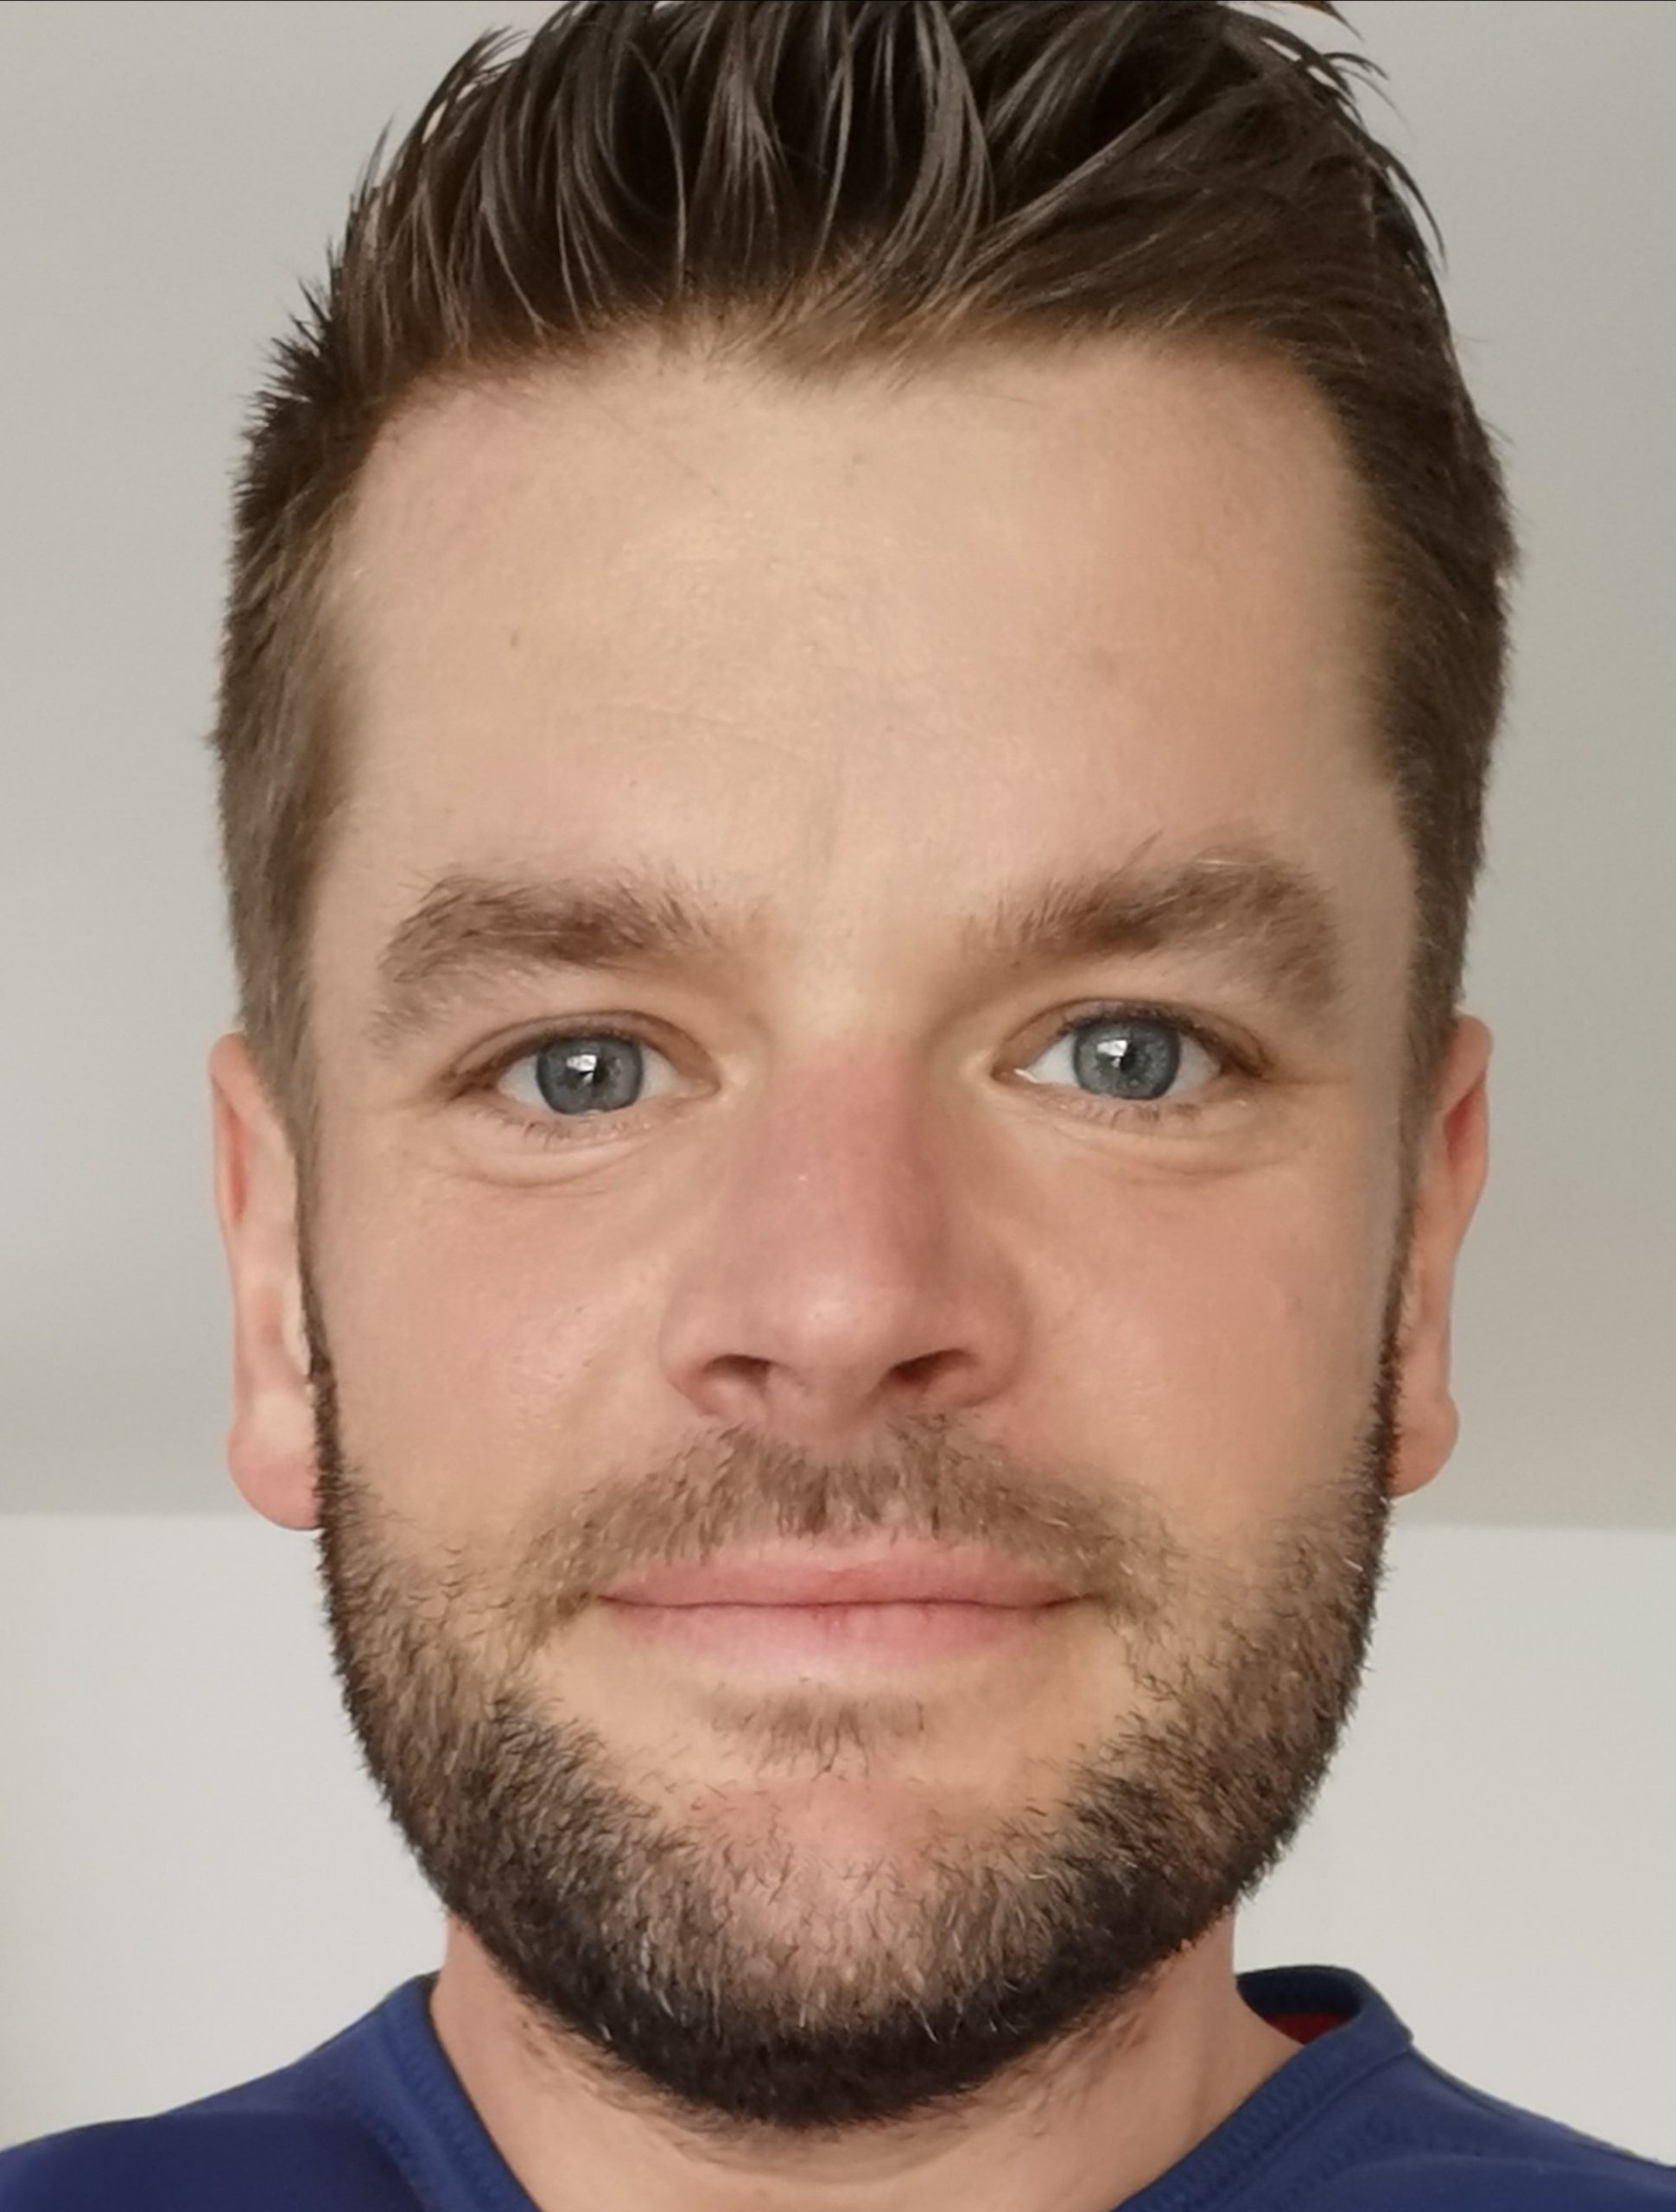 Christoph Abriß